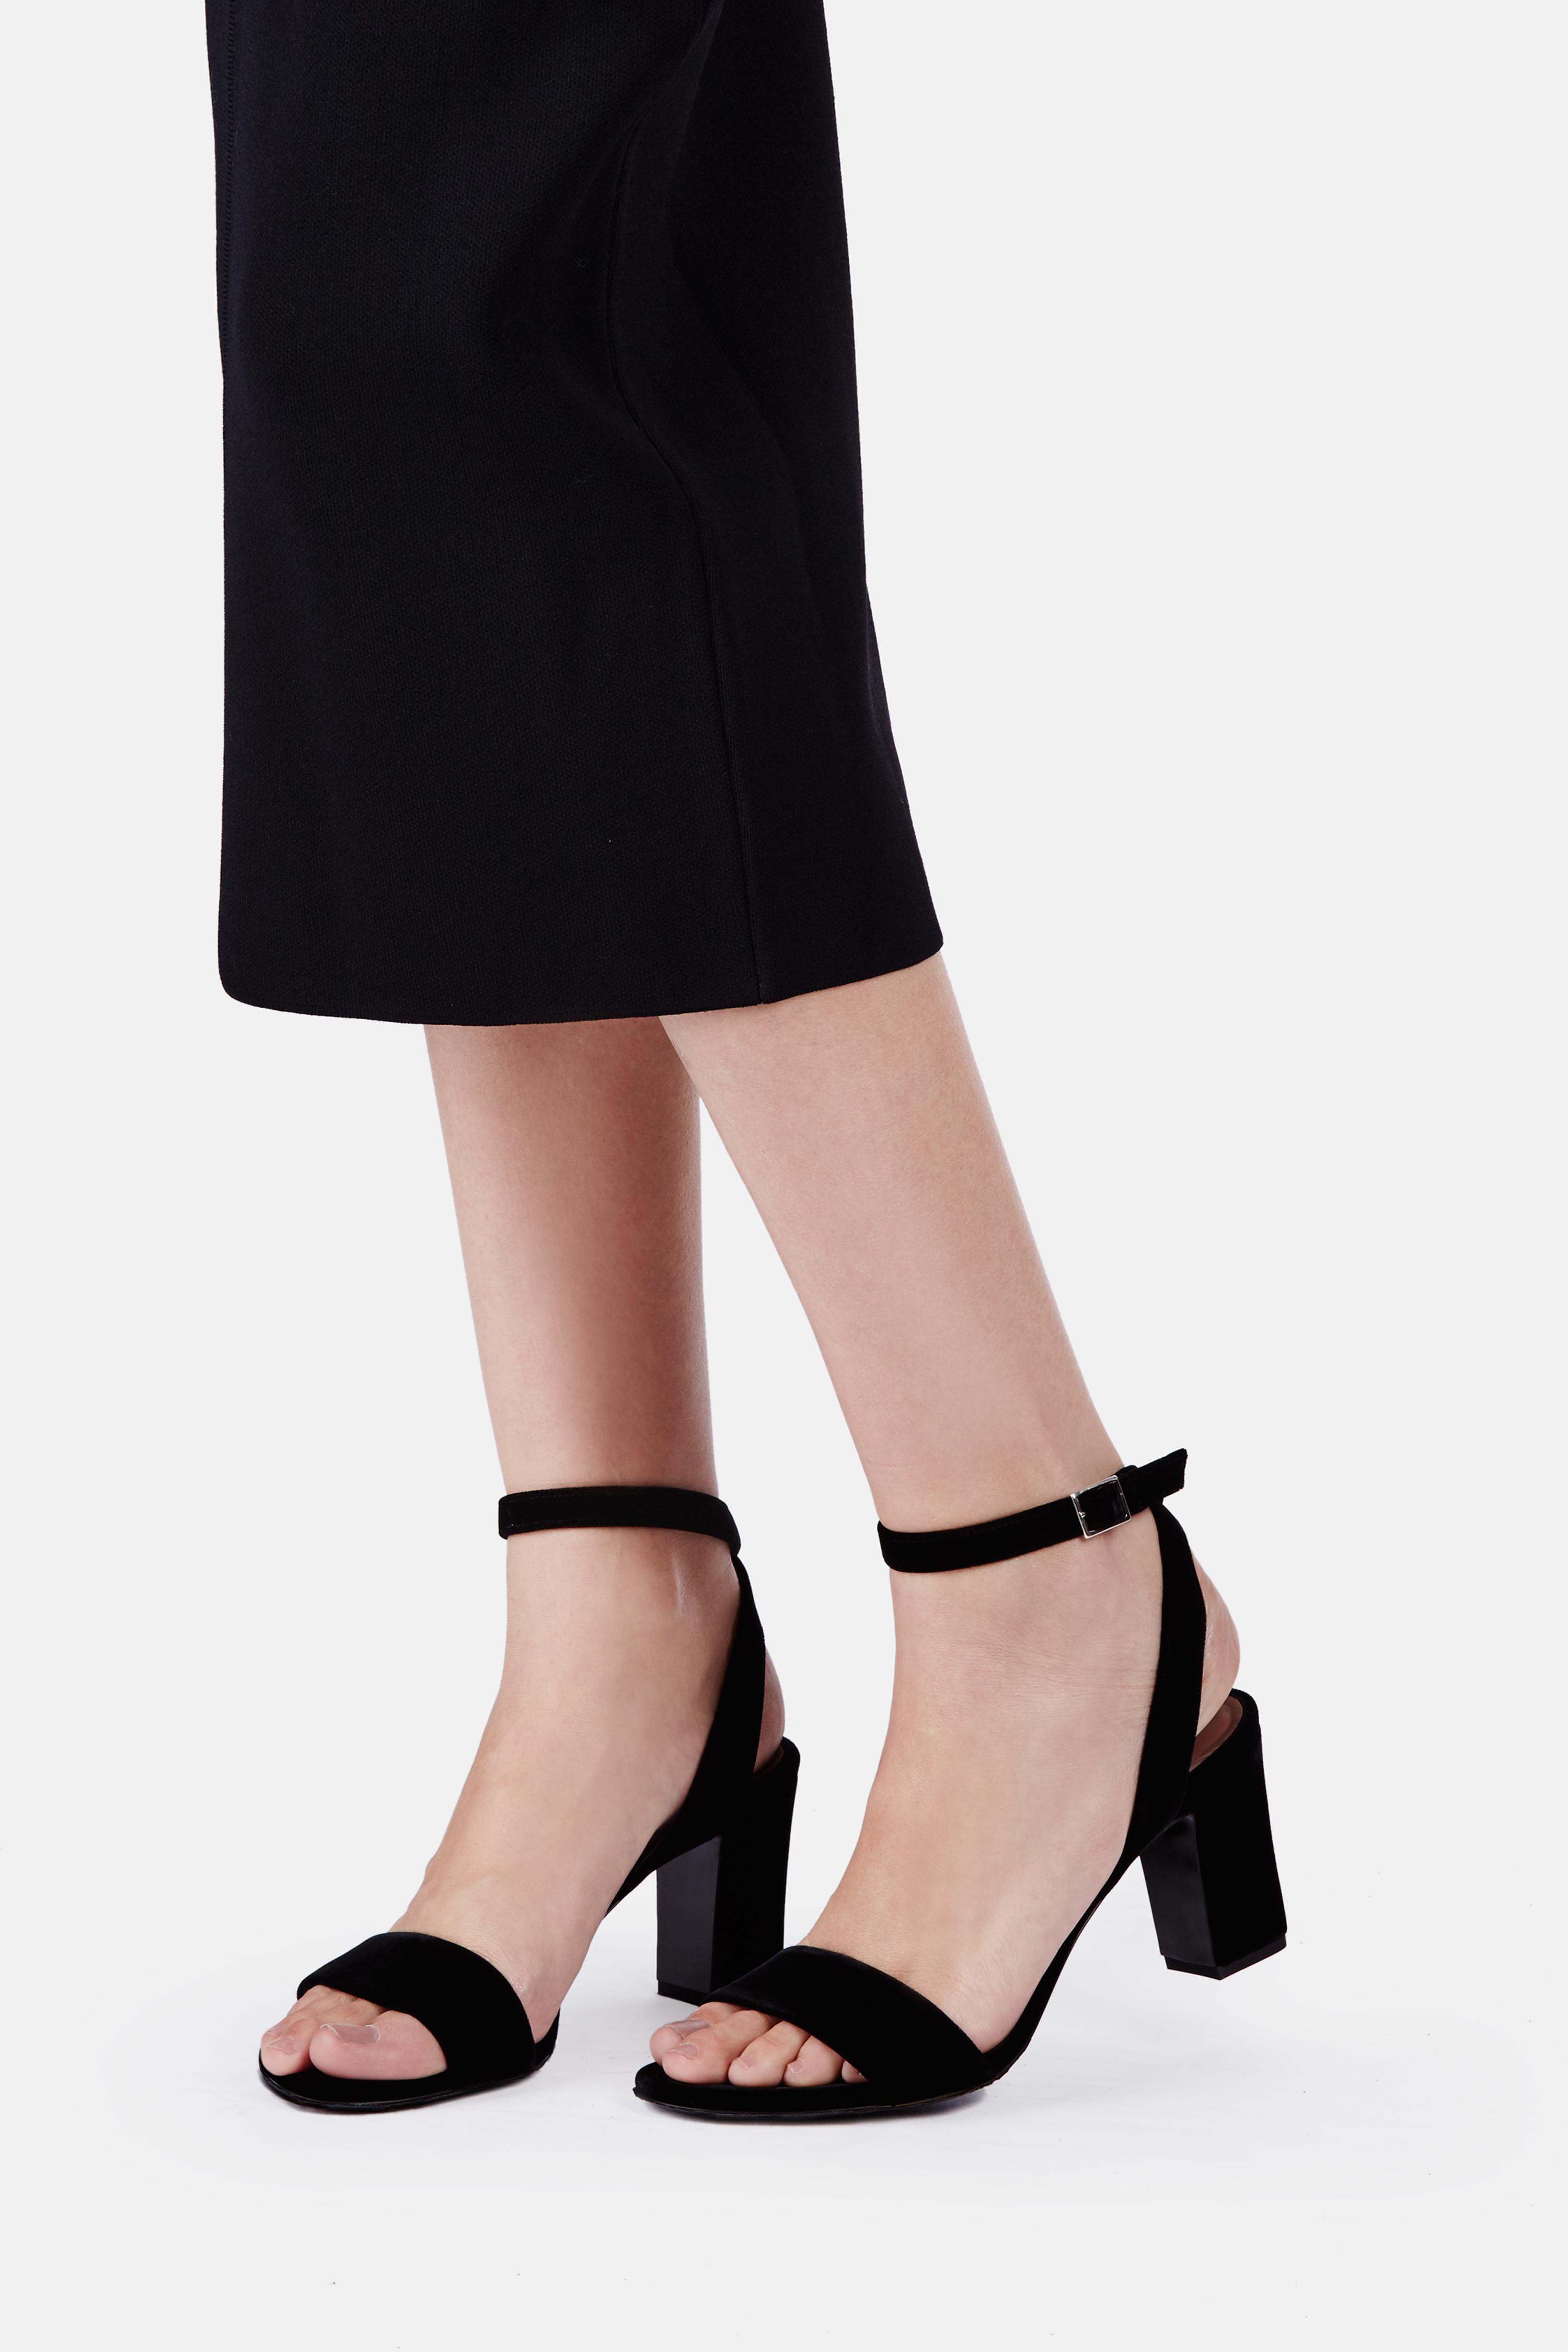 Tabitha Simmons Leticia satin sandals UUUiiZC